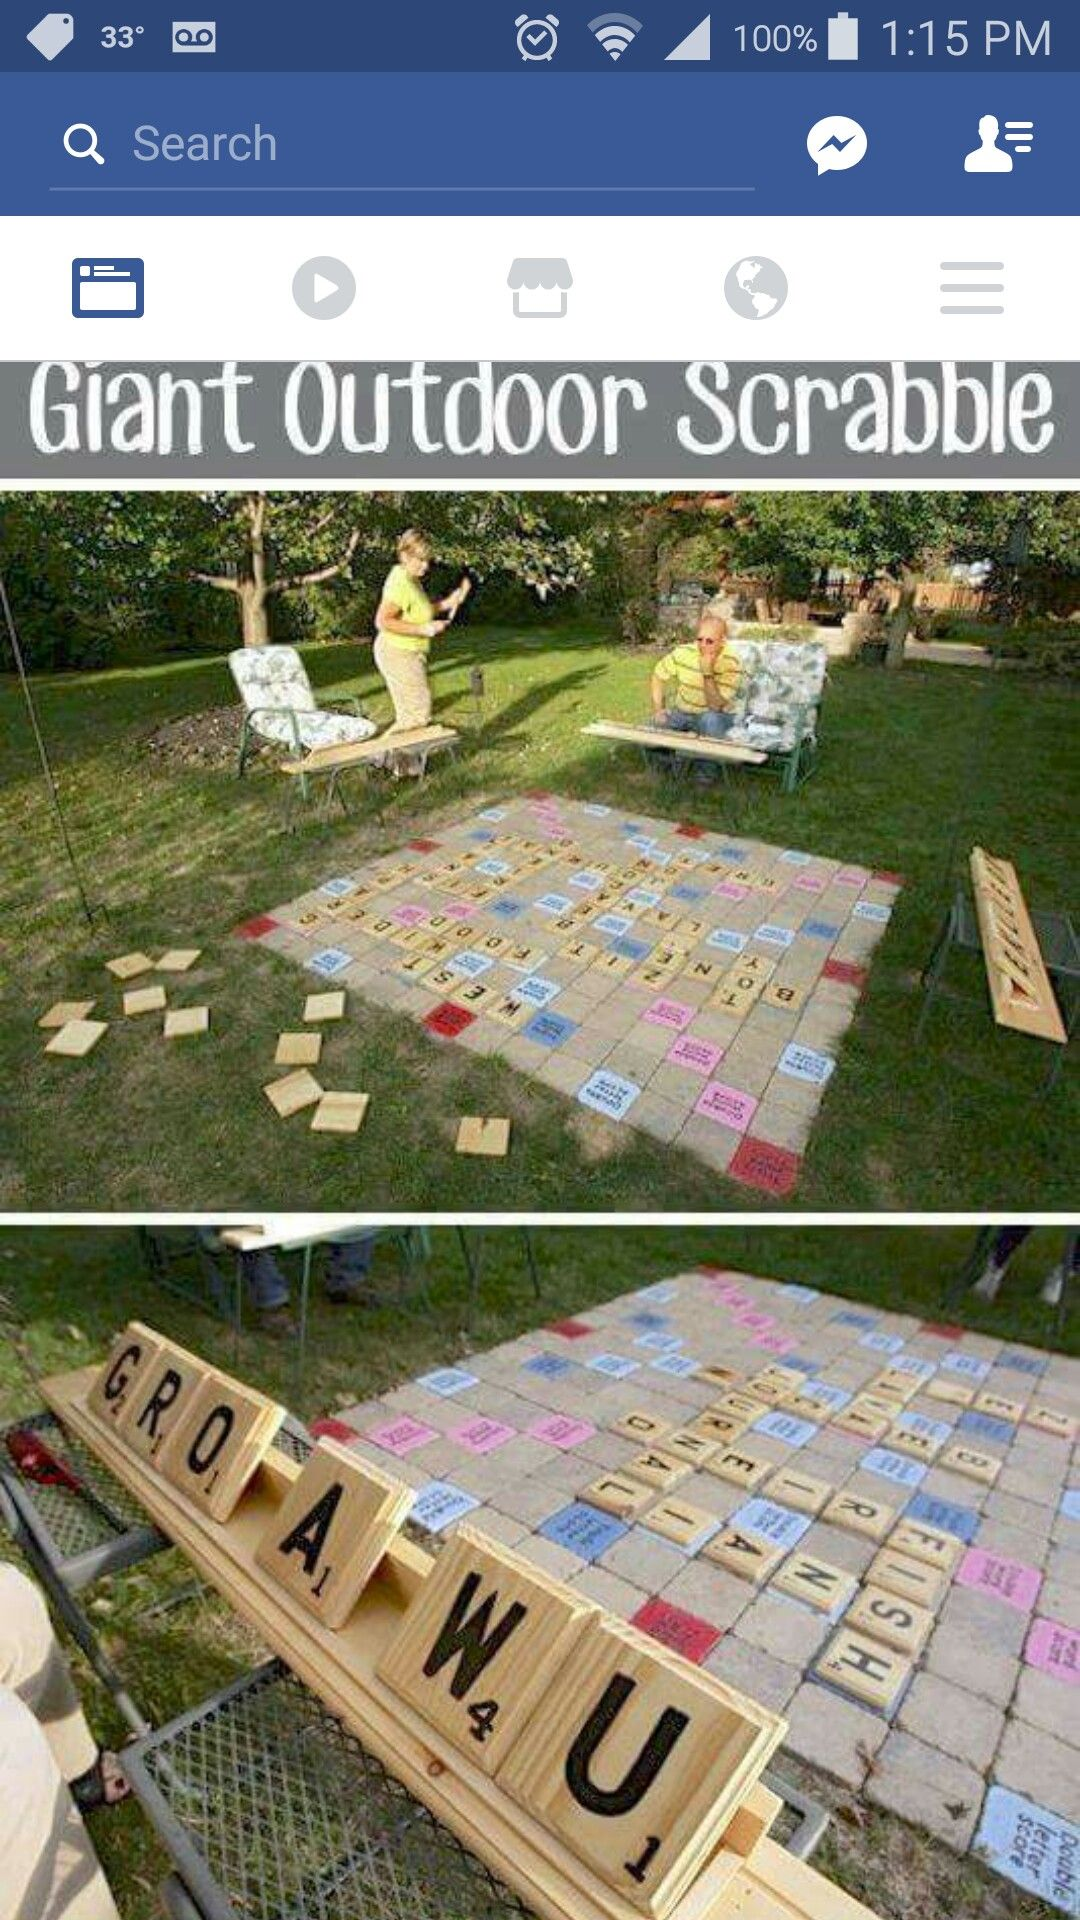 Giant Outdoor Scrabble Yes Please House Ideas Juegos Juegos